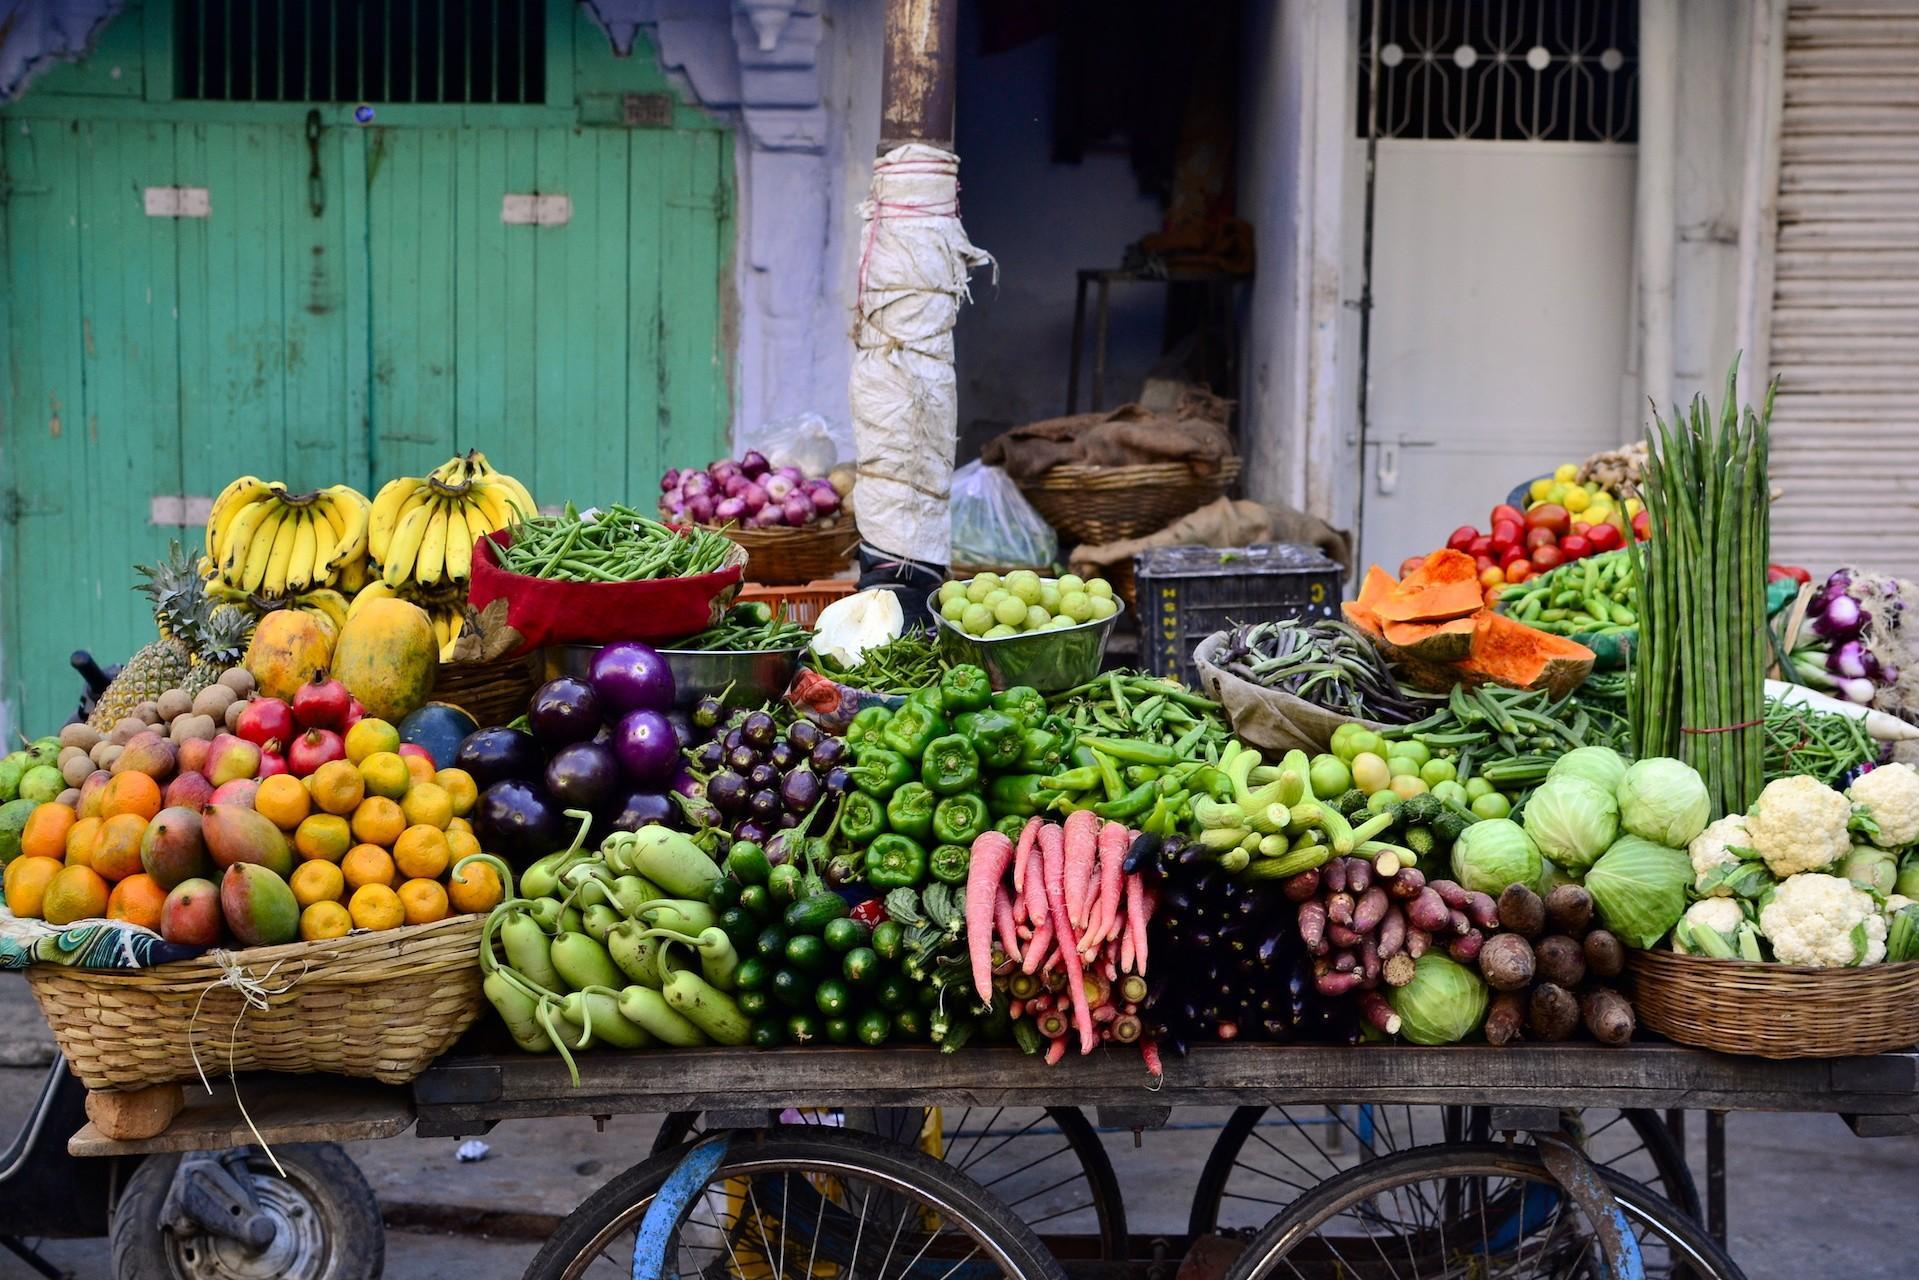 Indian vegetable cart